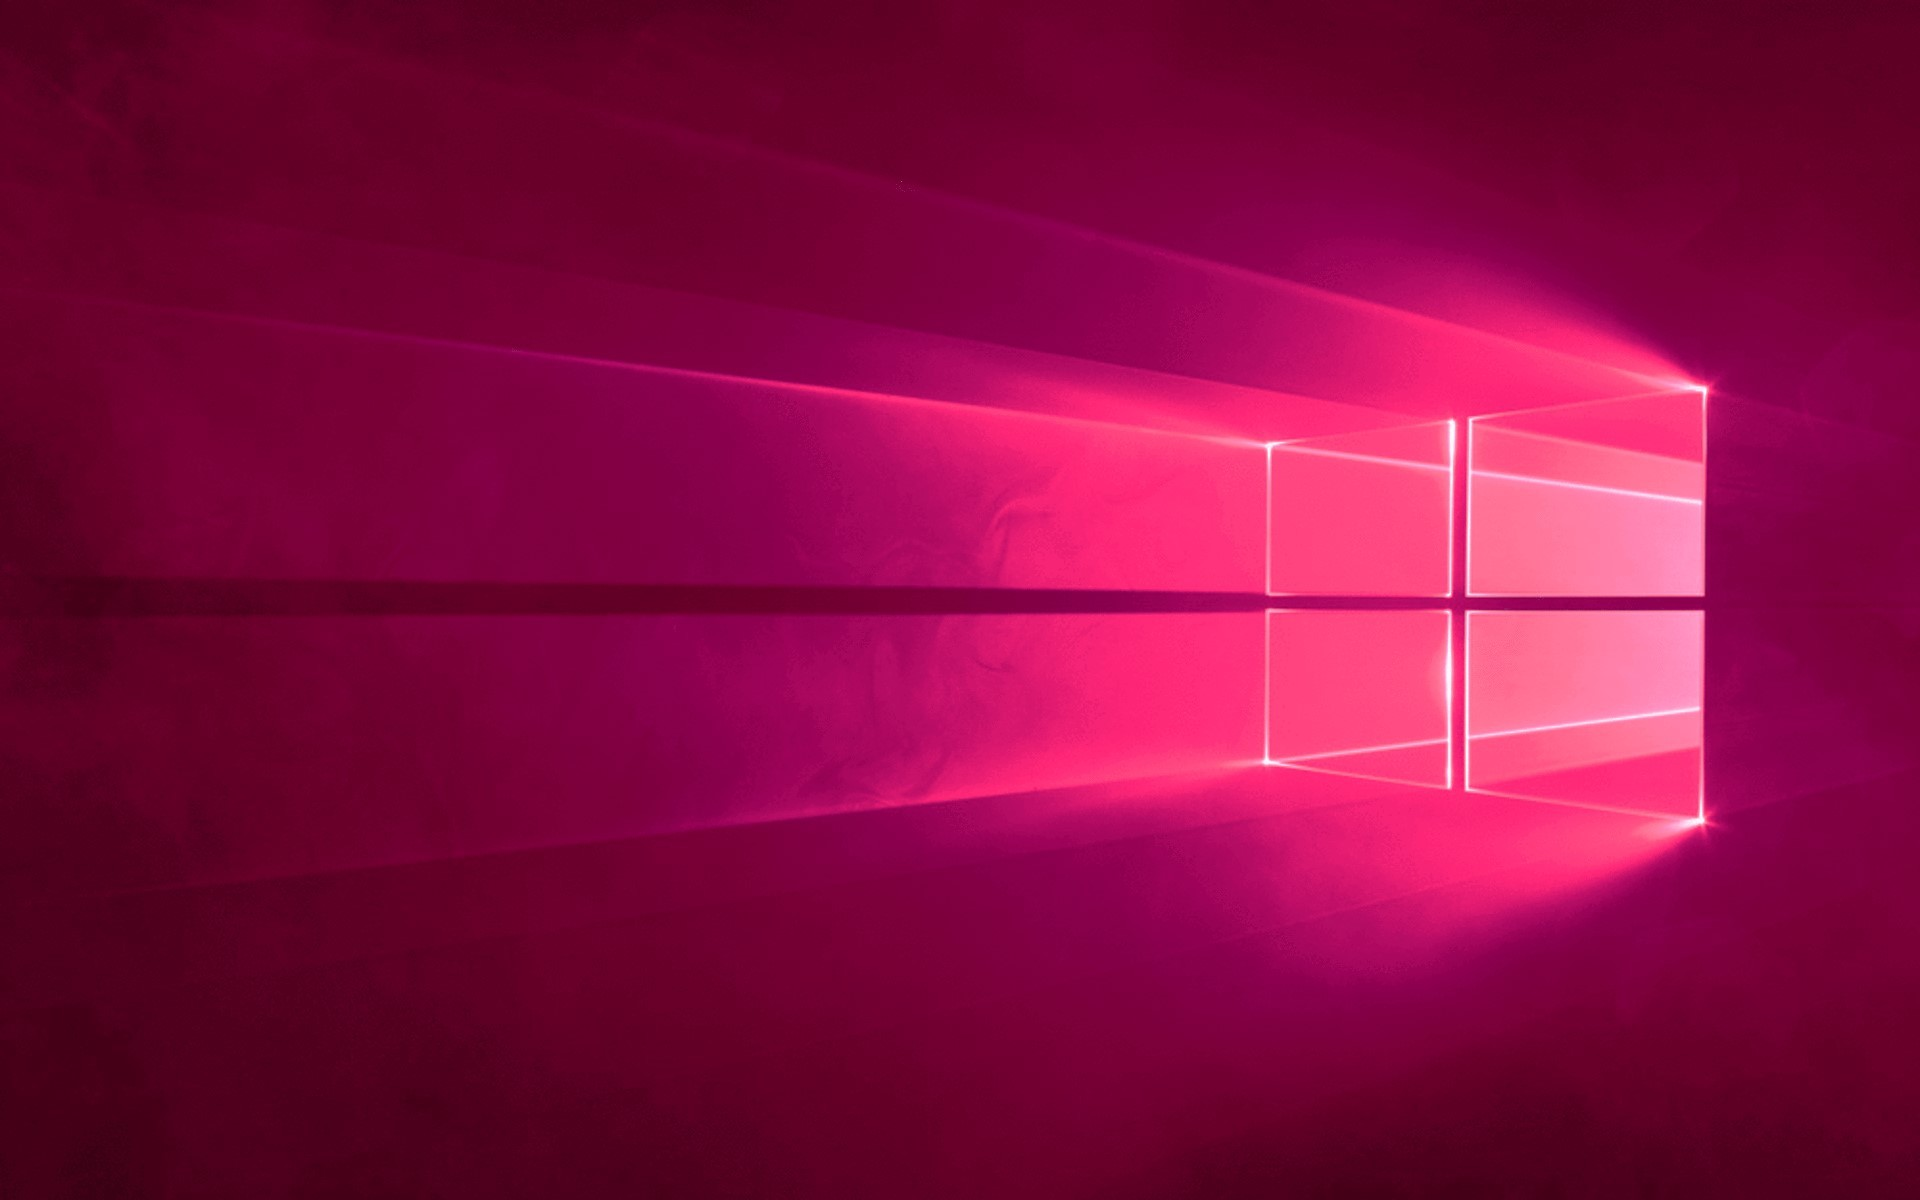 … Windows 10 Wallpaper (Magenta Tint) by Typhlosion24